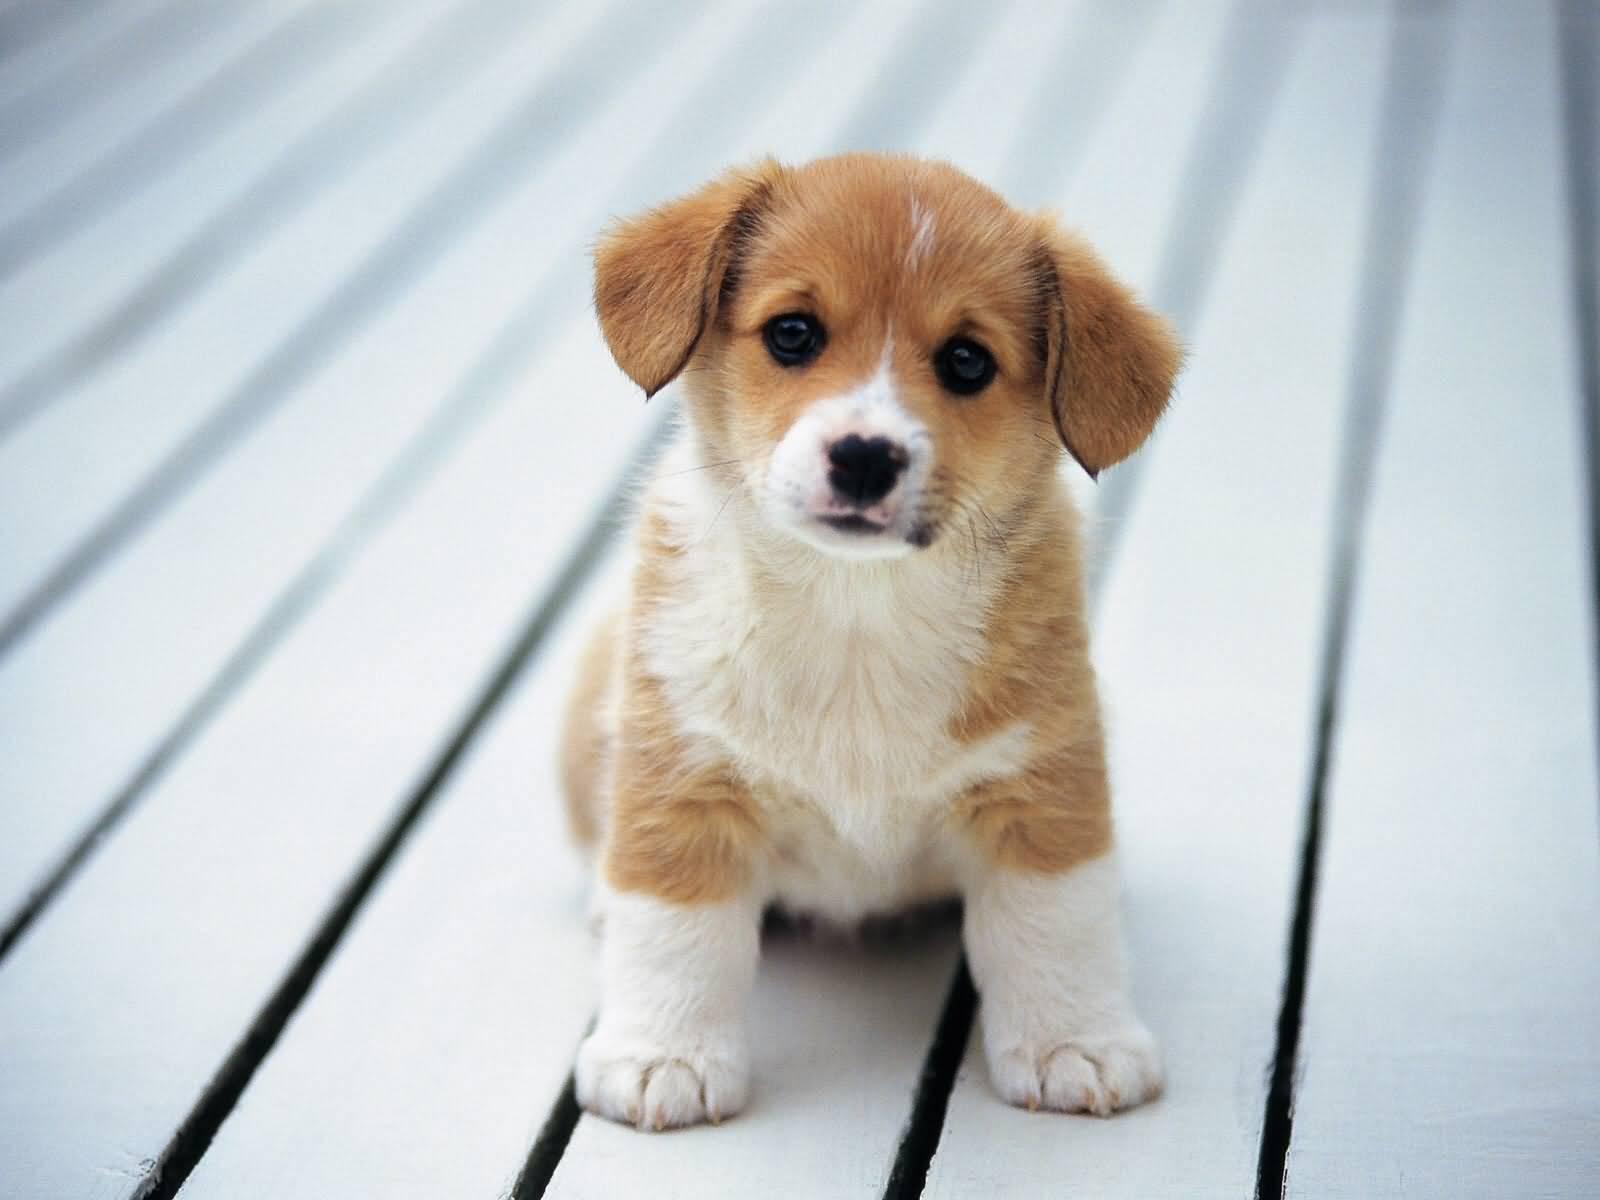 Cute Beagle Puppy Sitting Picture